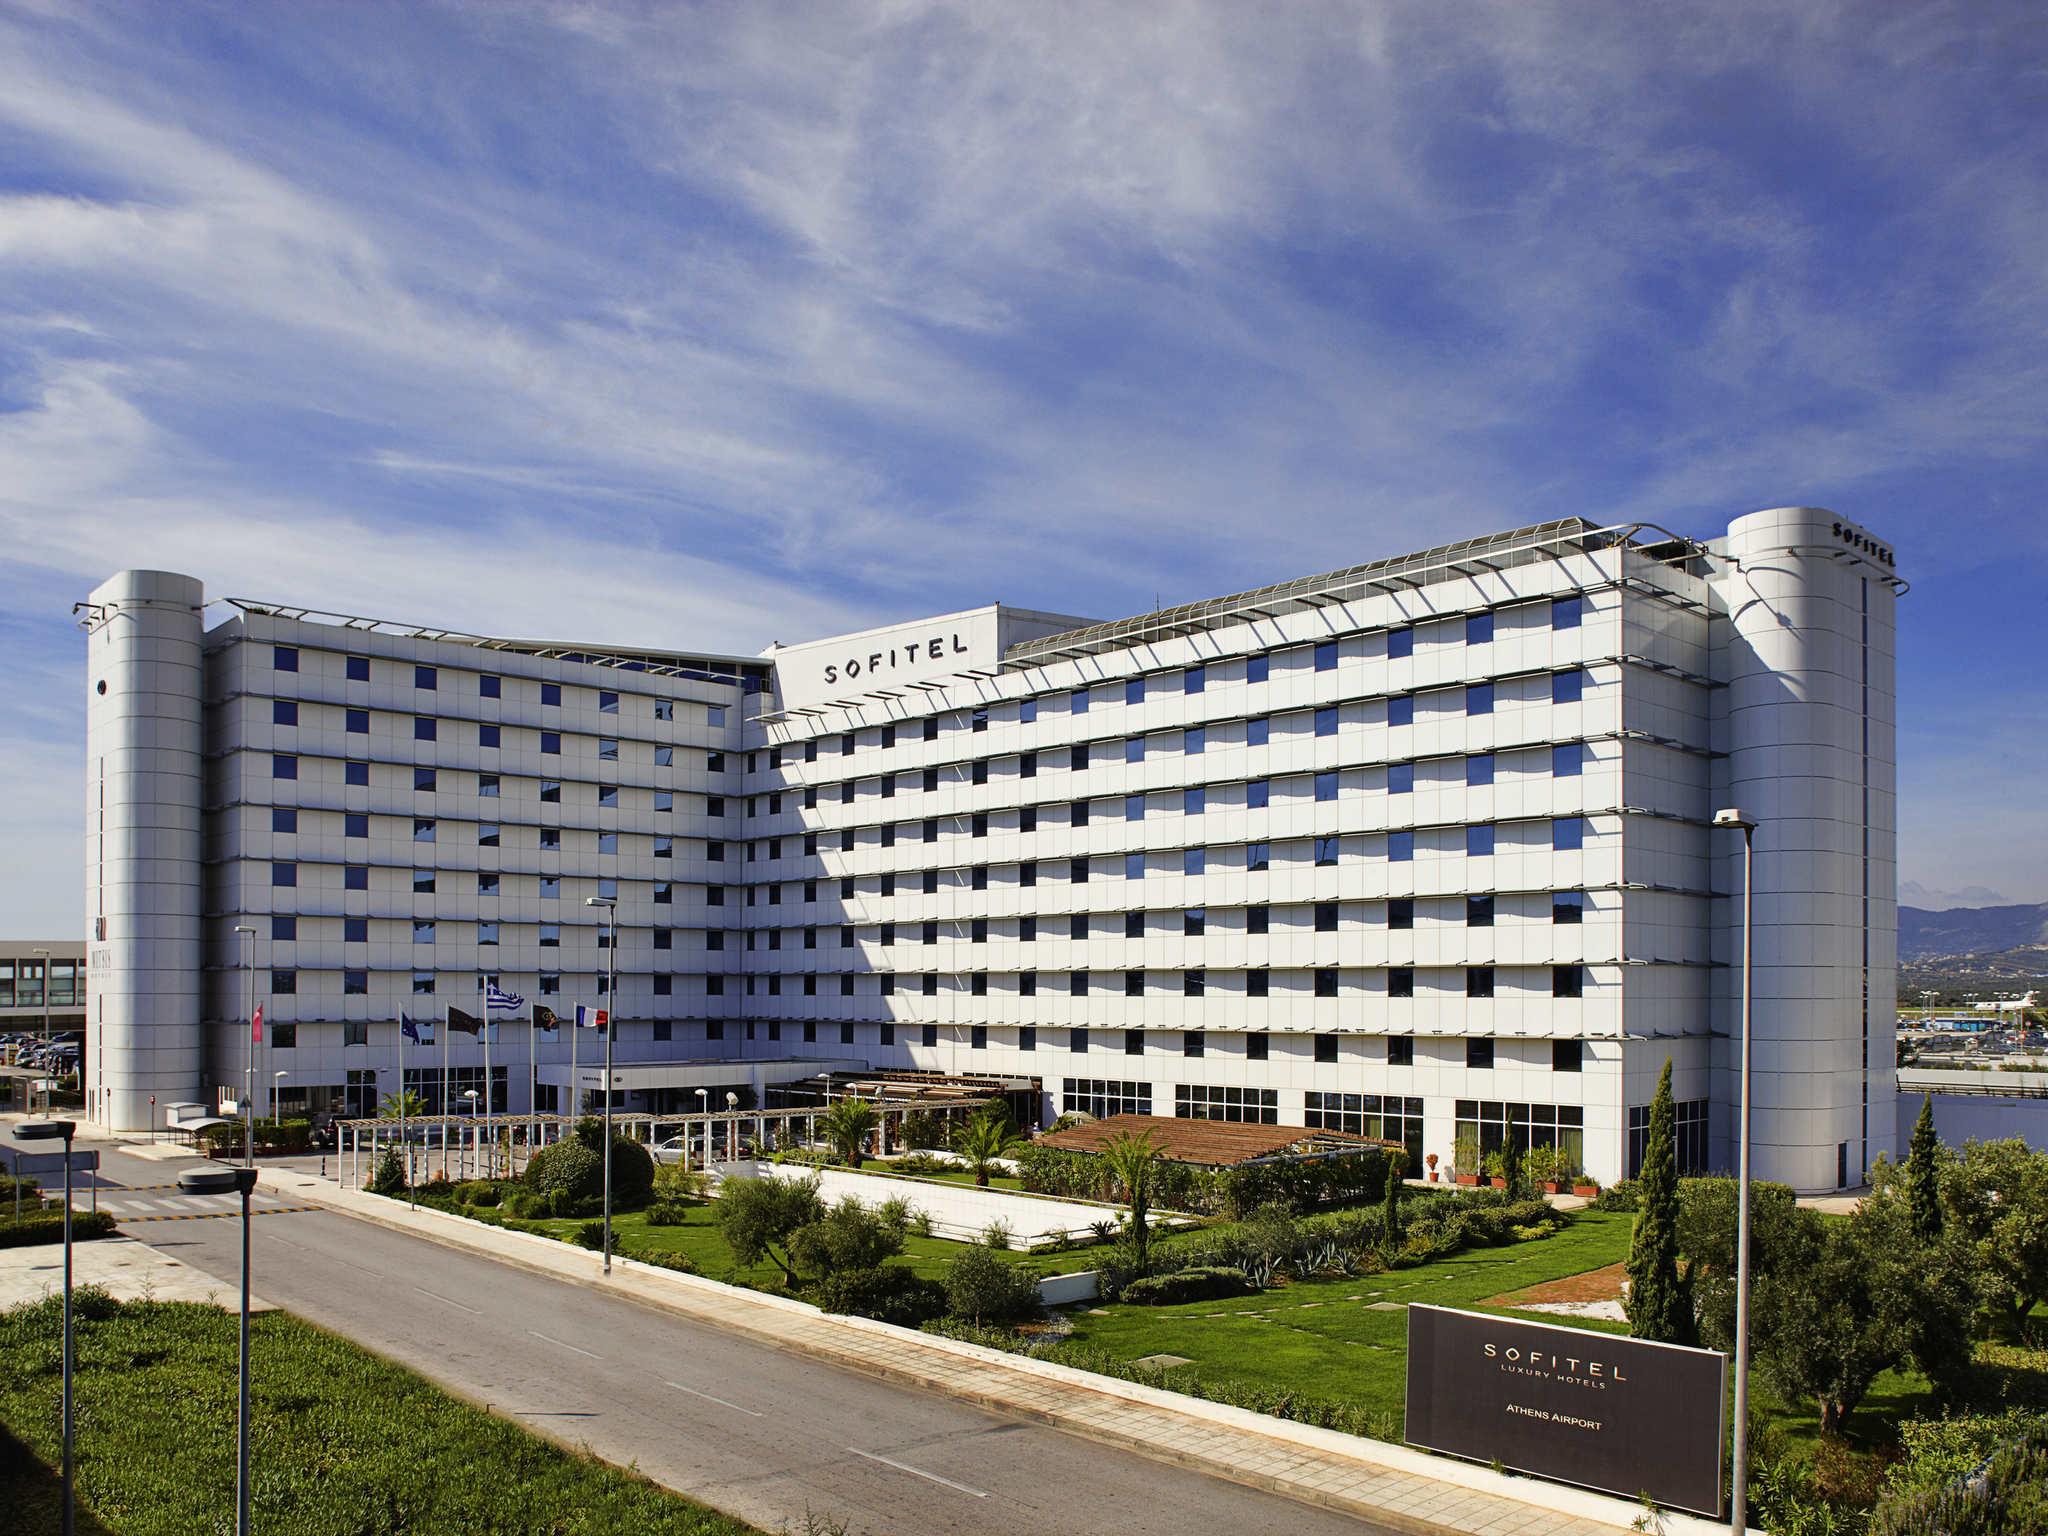 Hotel - Sofitel Athens Airport